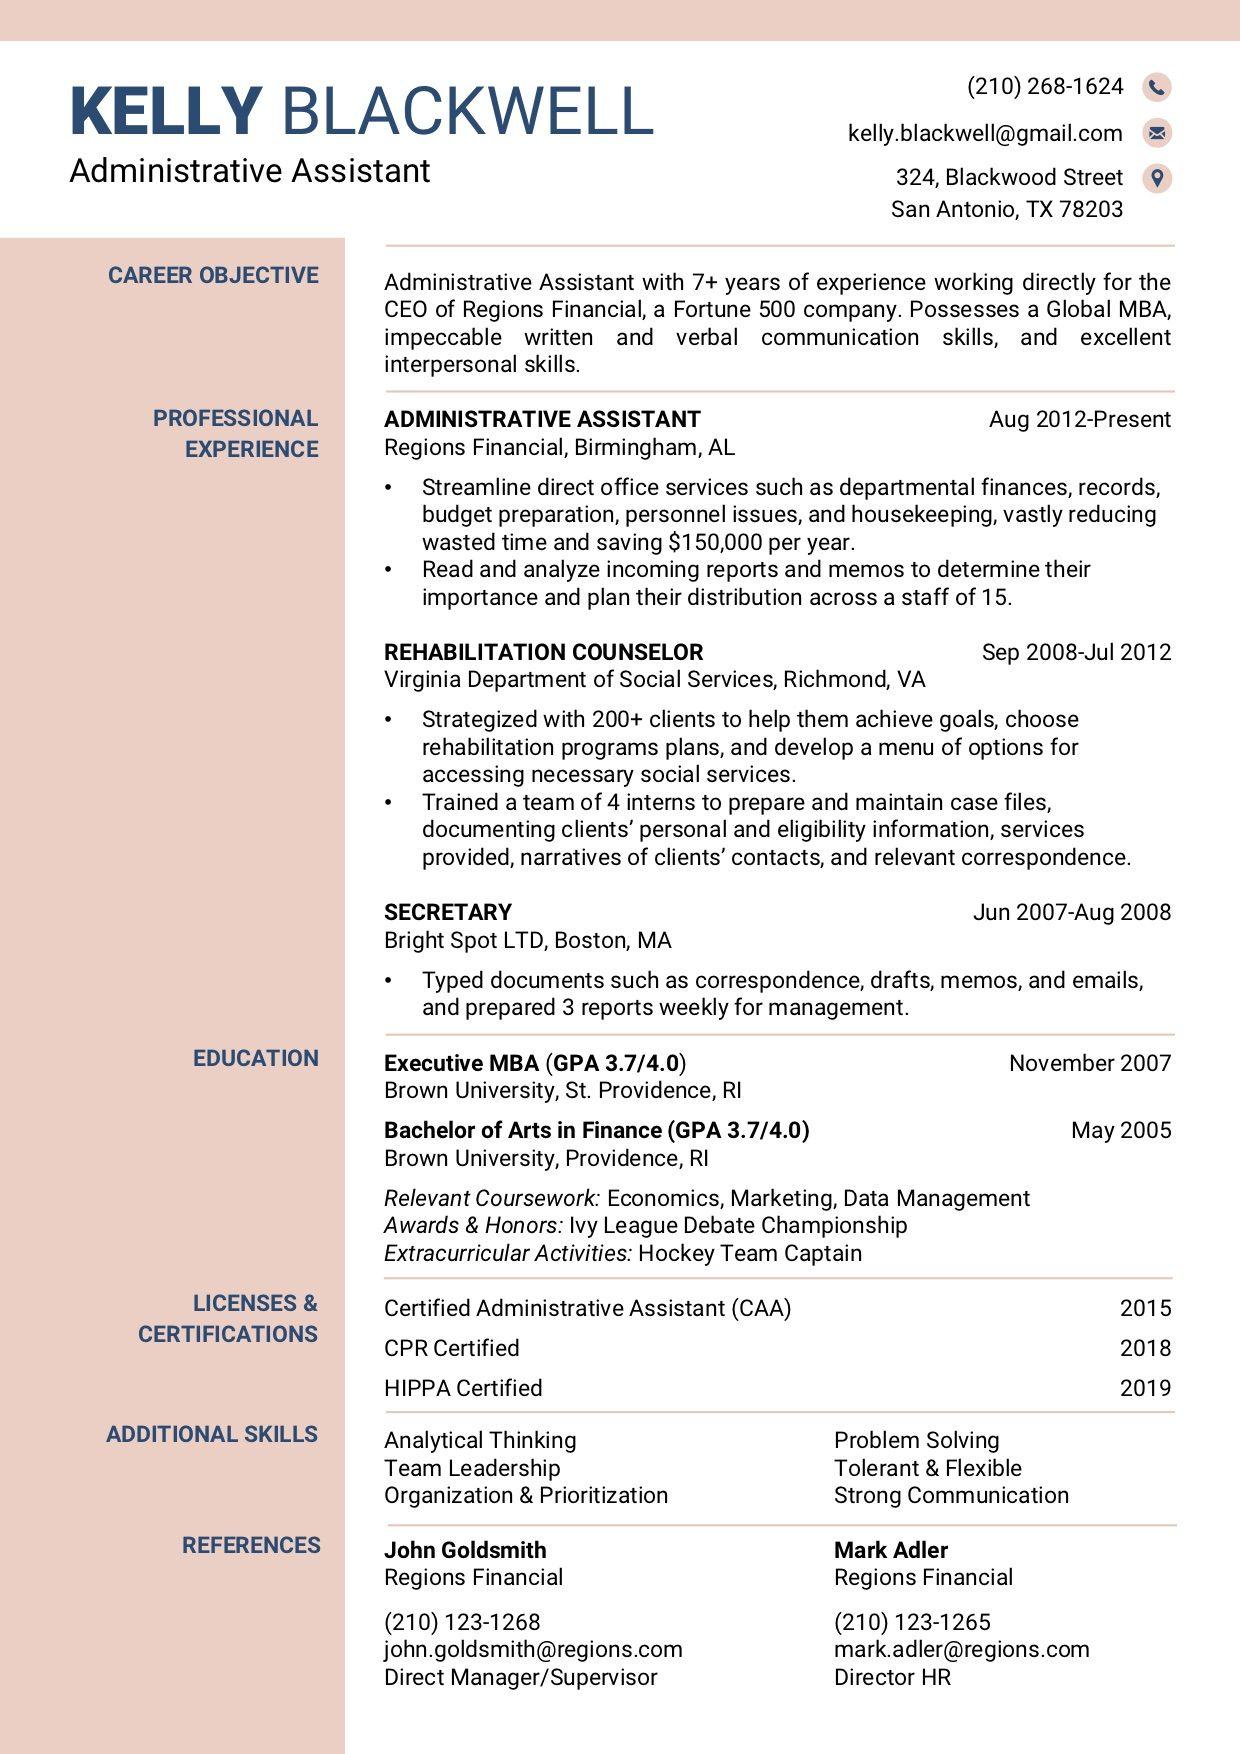 Resume Template 1c Rc Resume Template Professional Verbal Communication Skills Resume Template Free